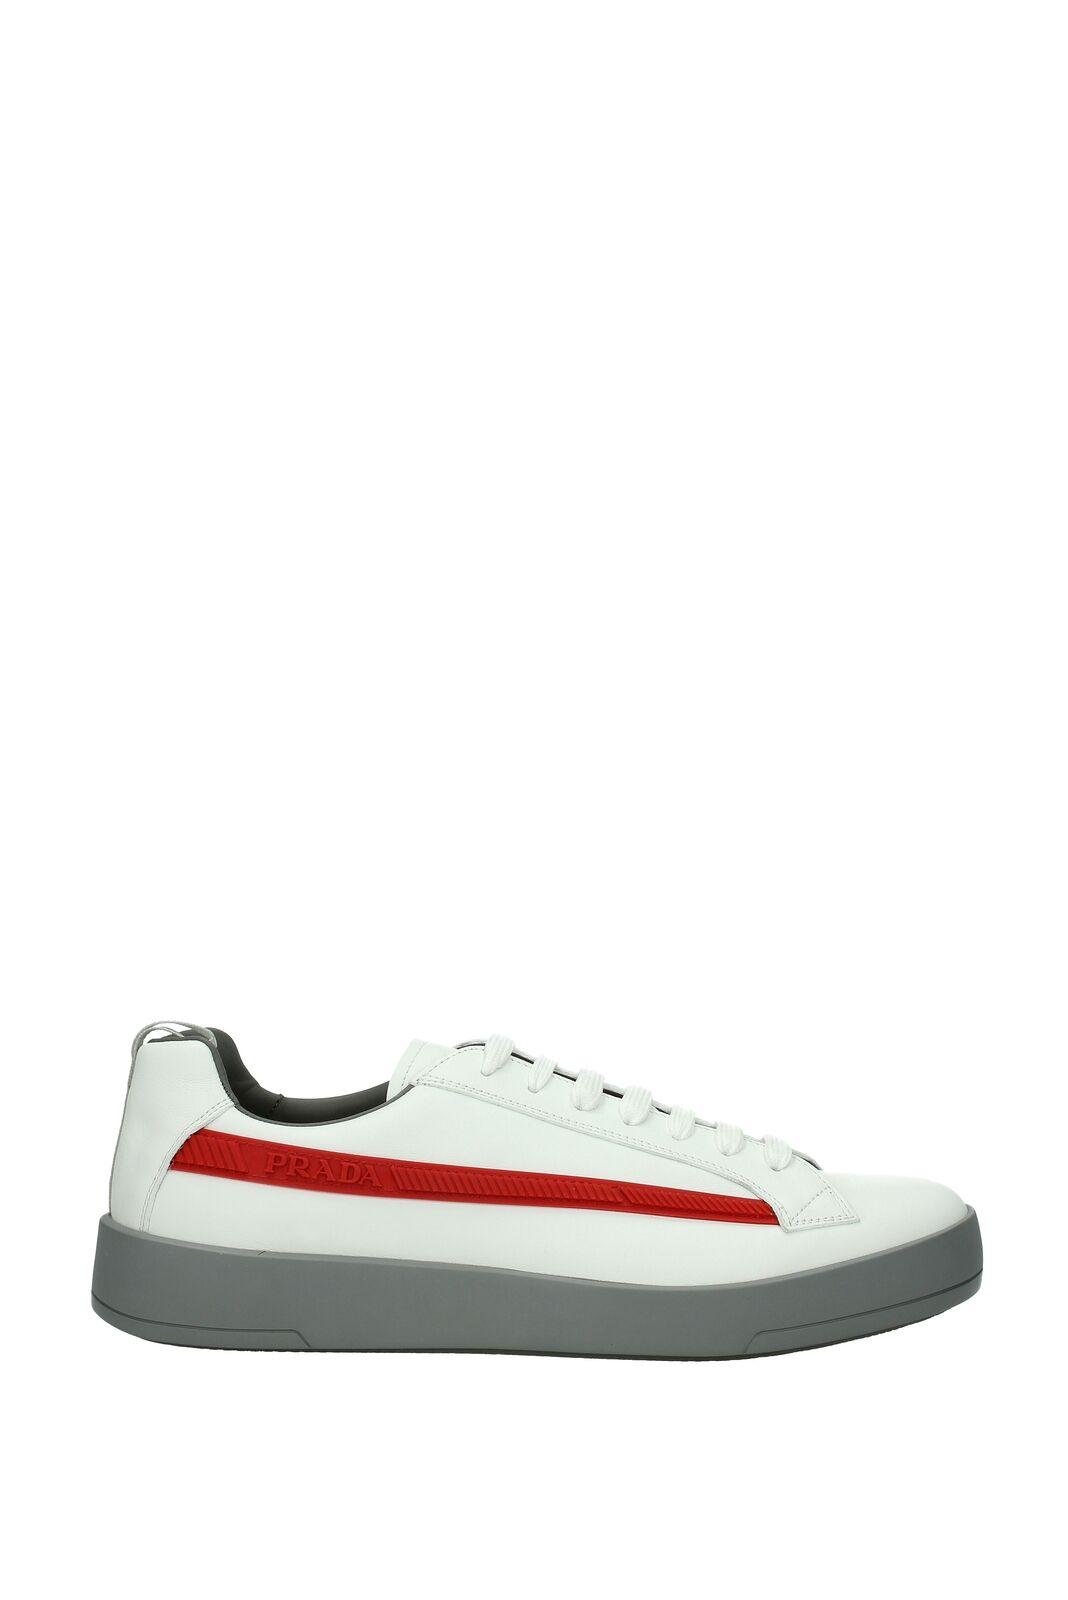 Sneakers Prada Men - Leather (4E3196VITELLOPLUME)